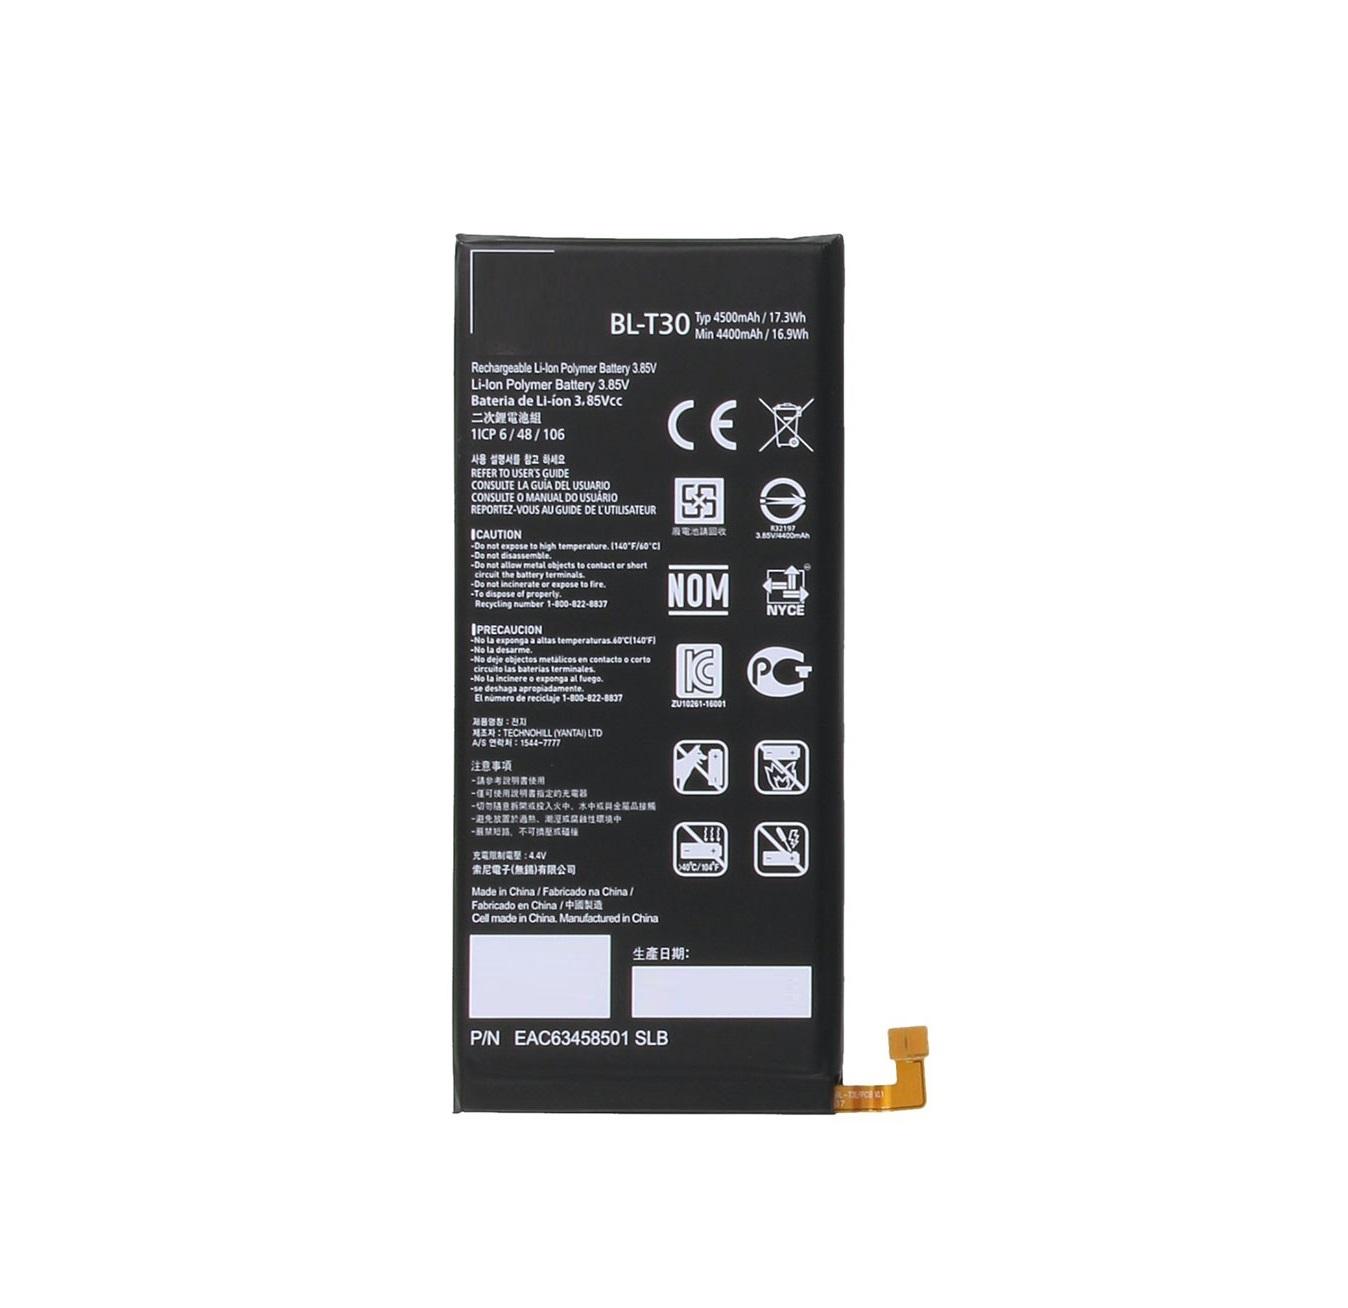 Аккумулятор для LG X Power 2 (M320) маркировка АКБ BL-T30 дата изготовления 2021 год!